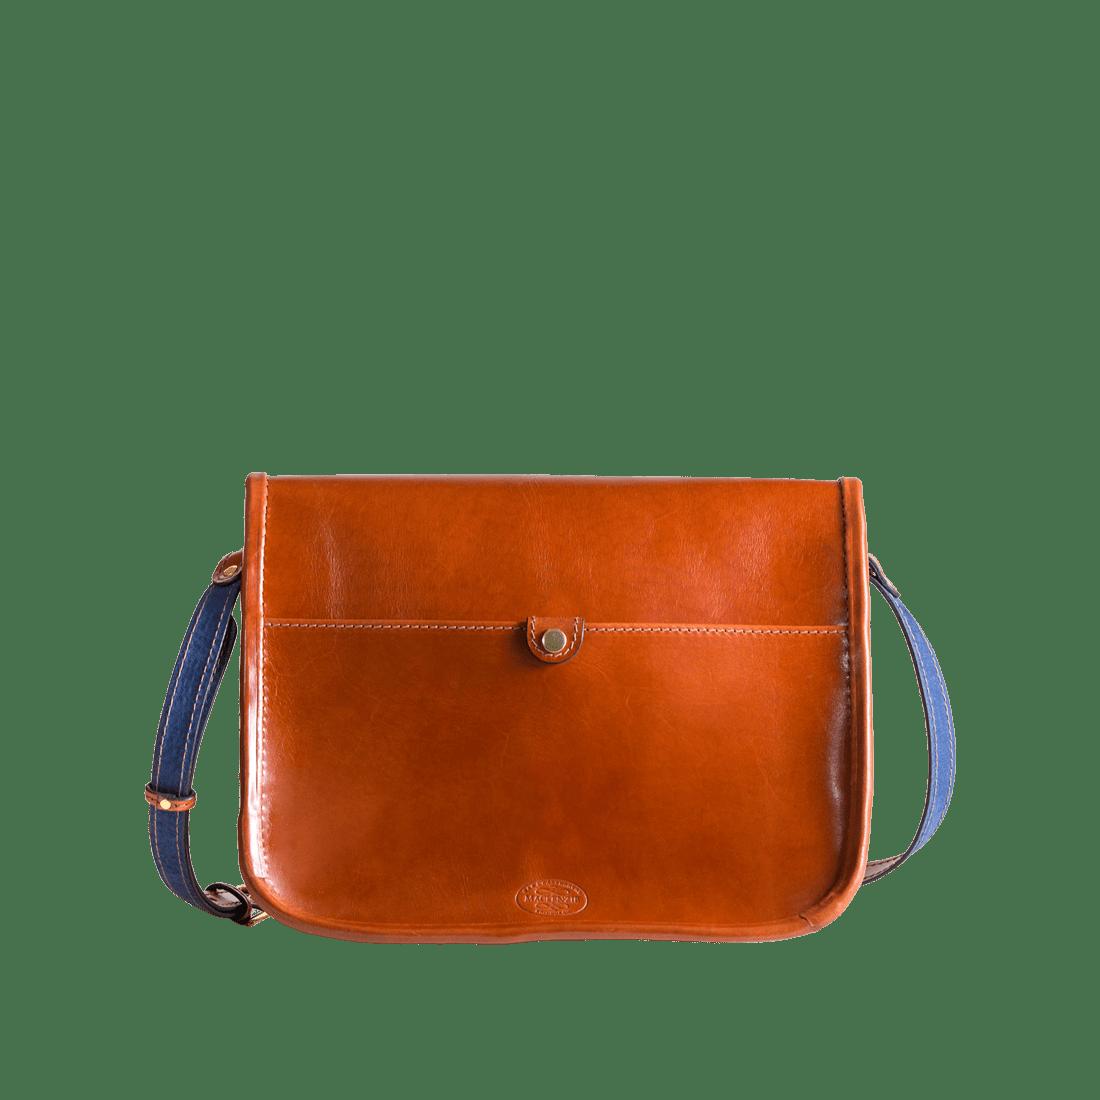 The classic satchel shiny tan